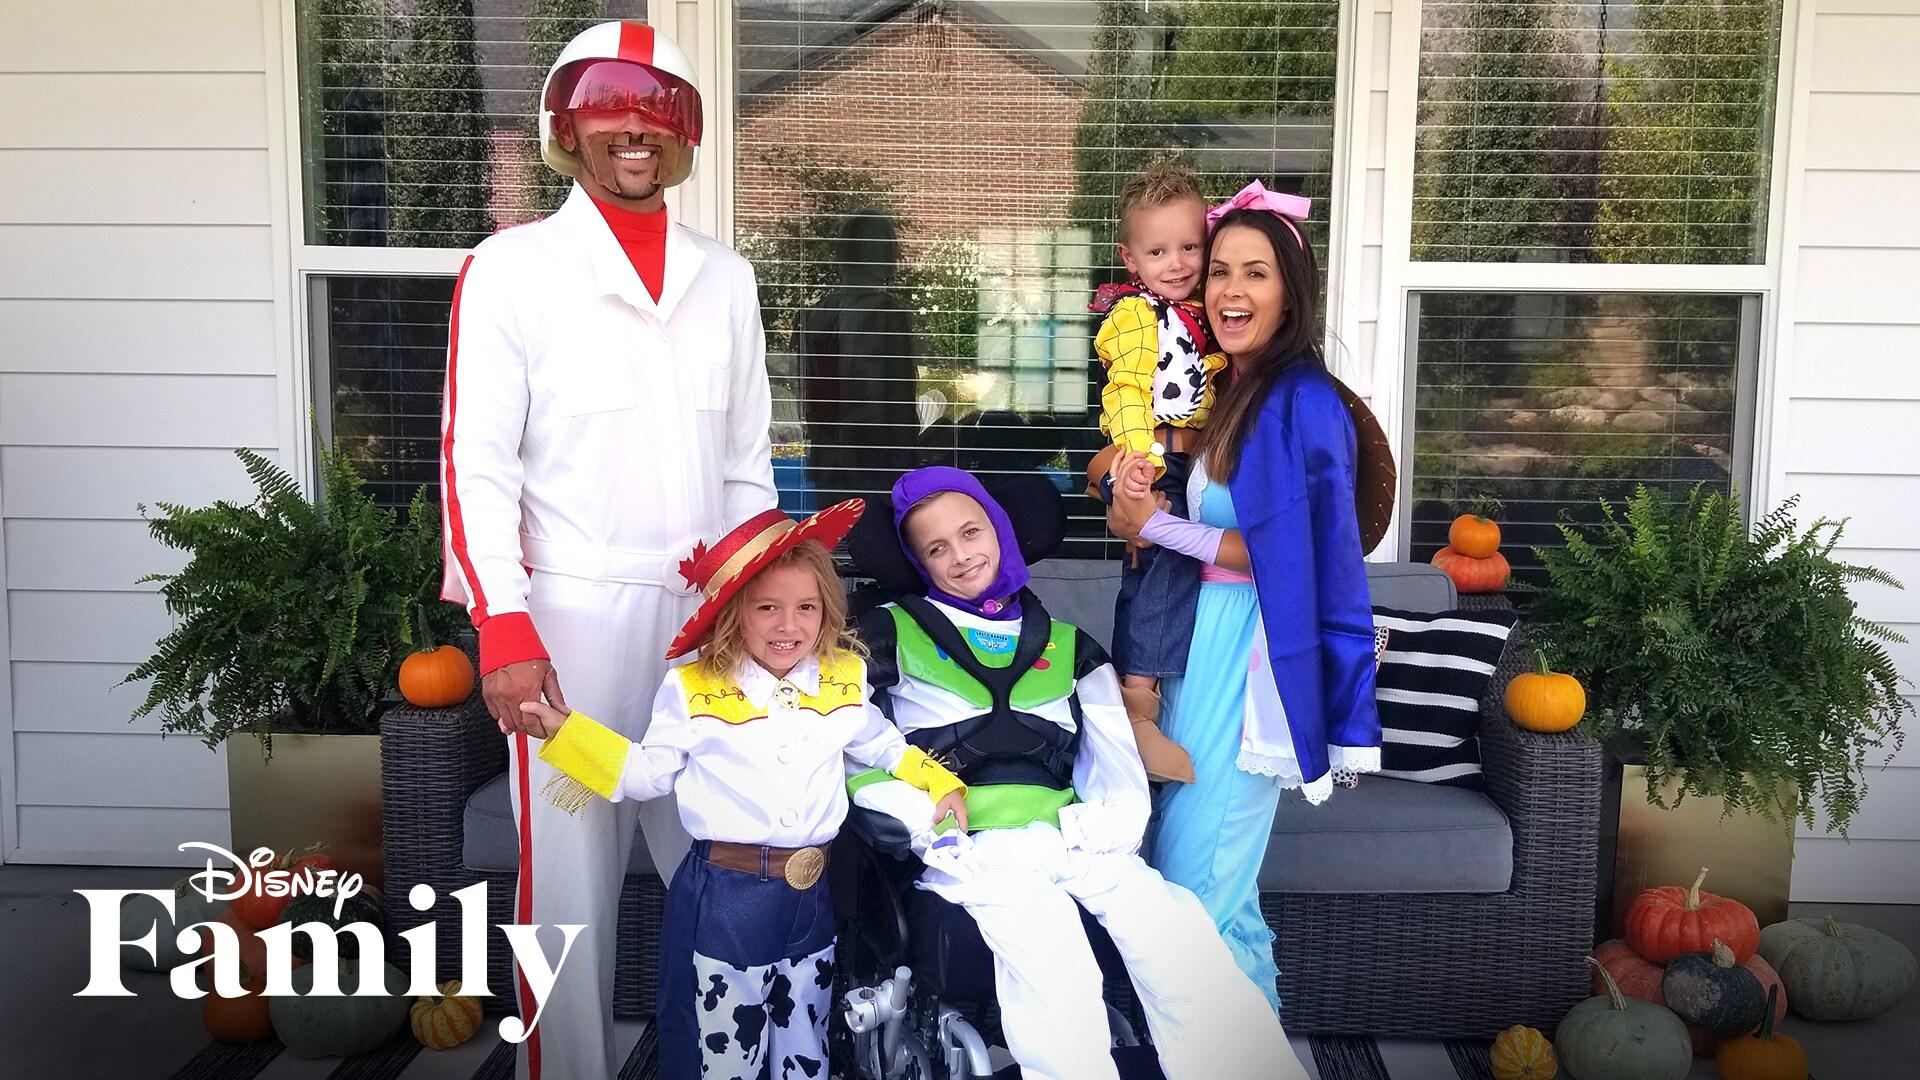 Toy Story 4 Family Costumes | Disney Family